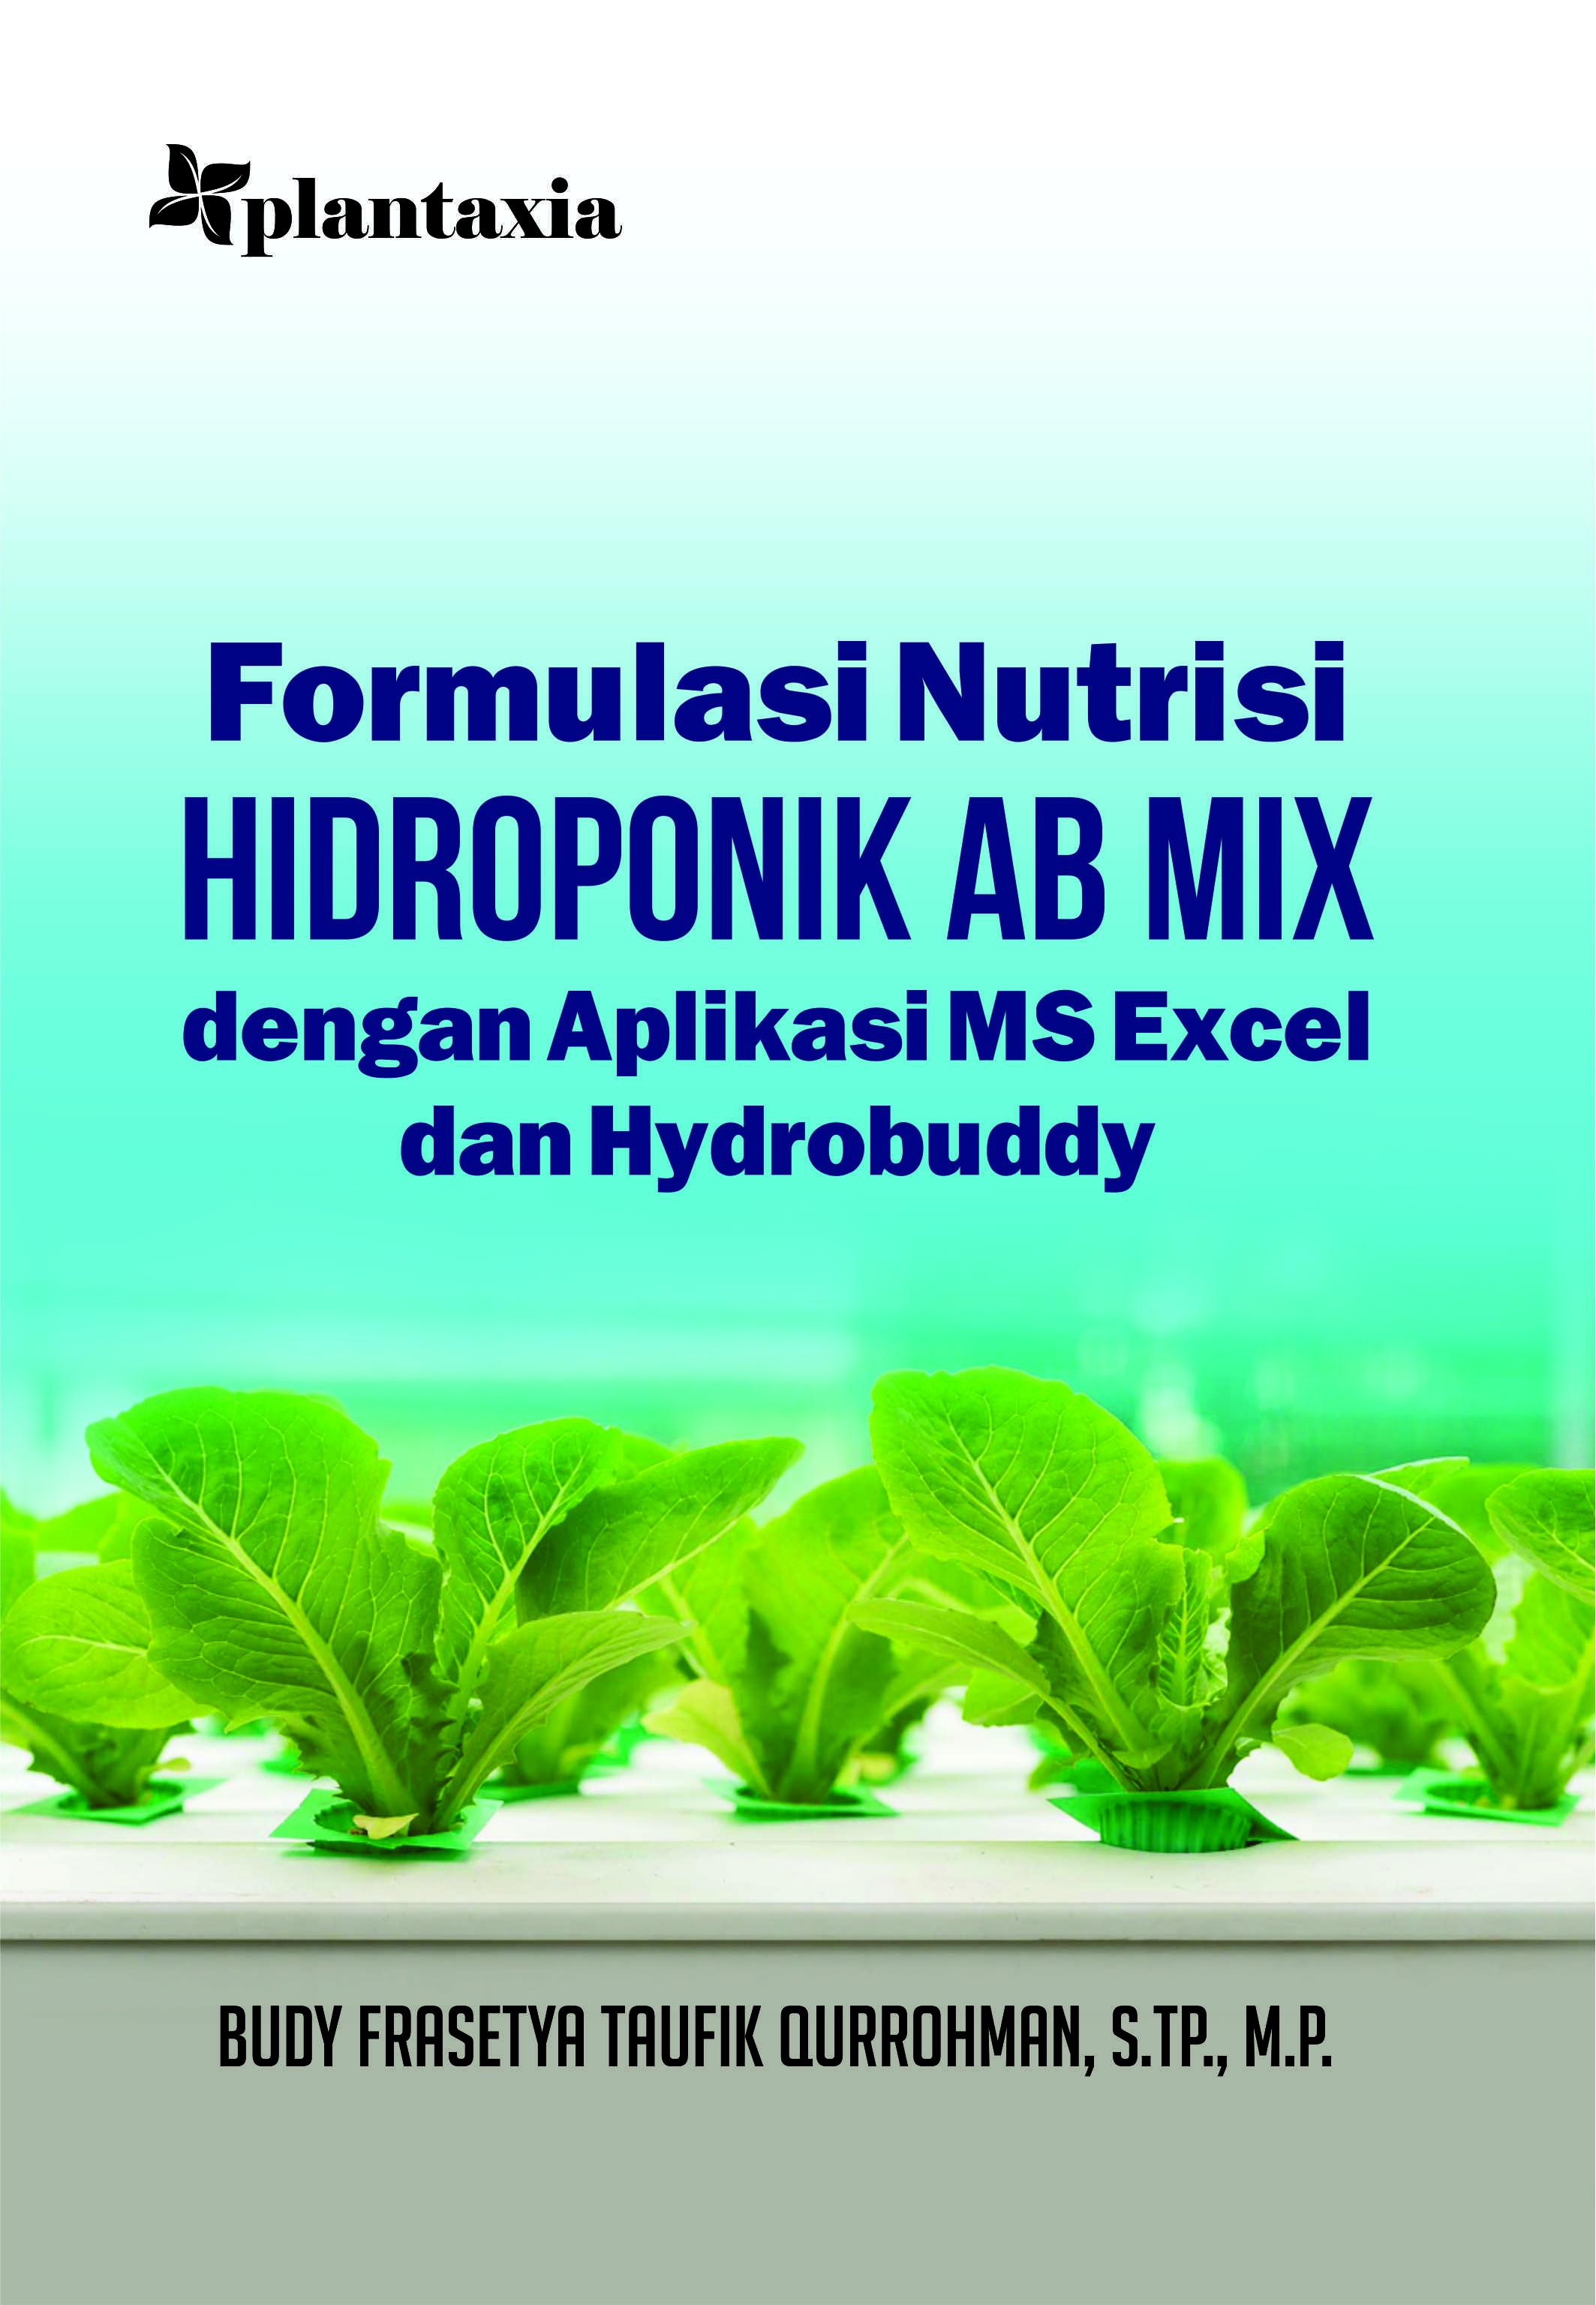 FORMULASI NUTRISI HIDROPONIK AB MIX; dengan Aplikasi MS Excel dan Hydrobuddy